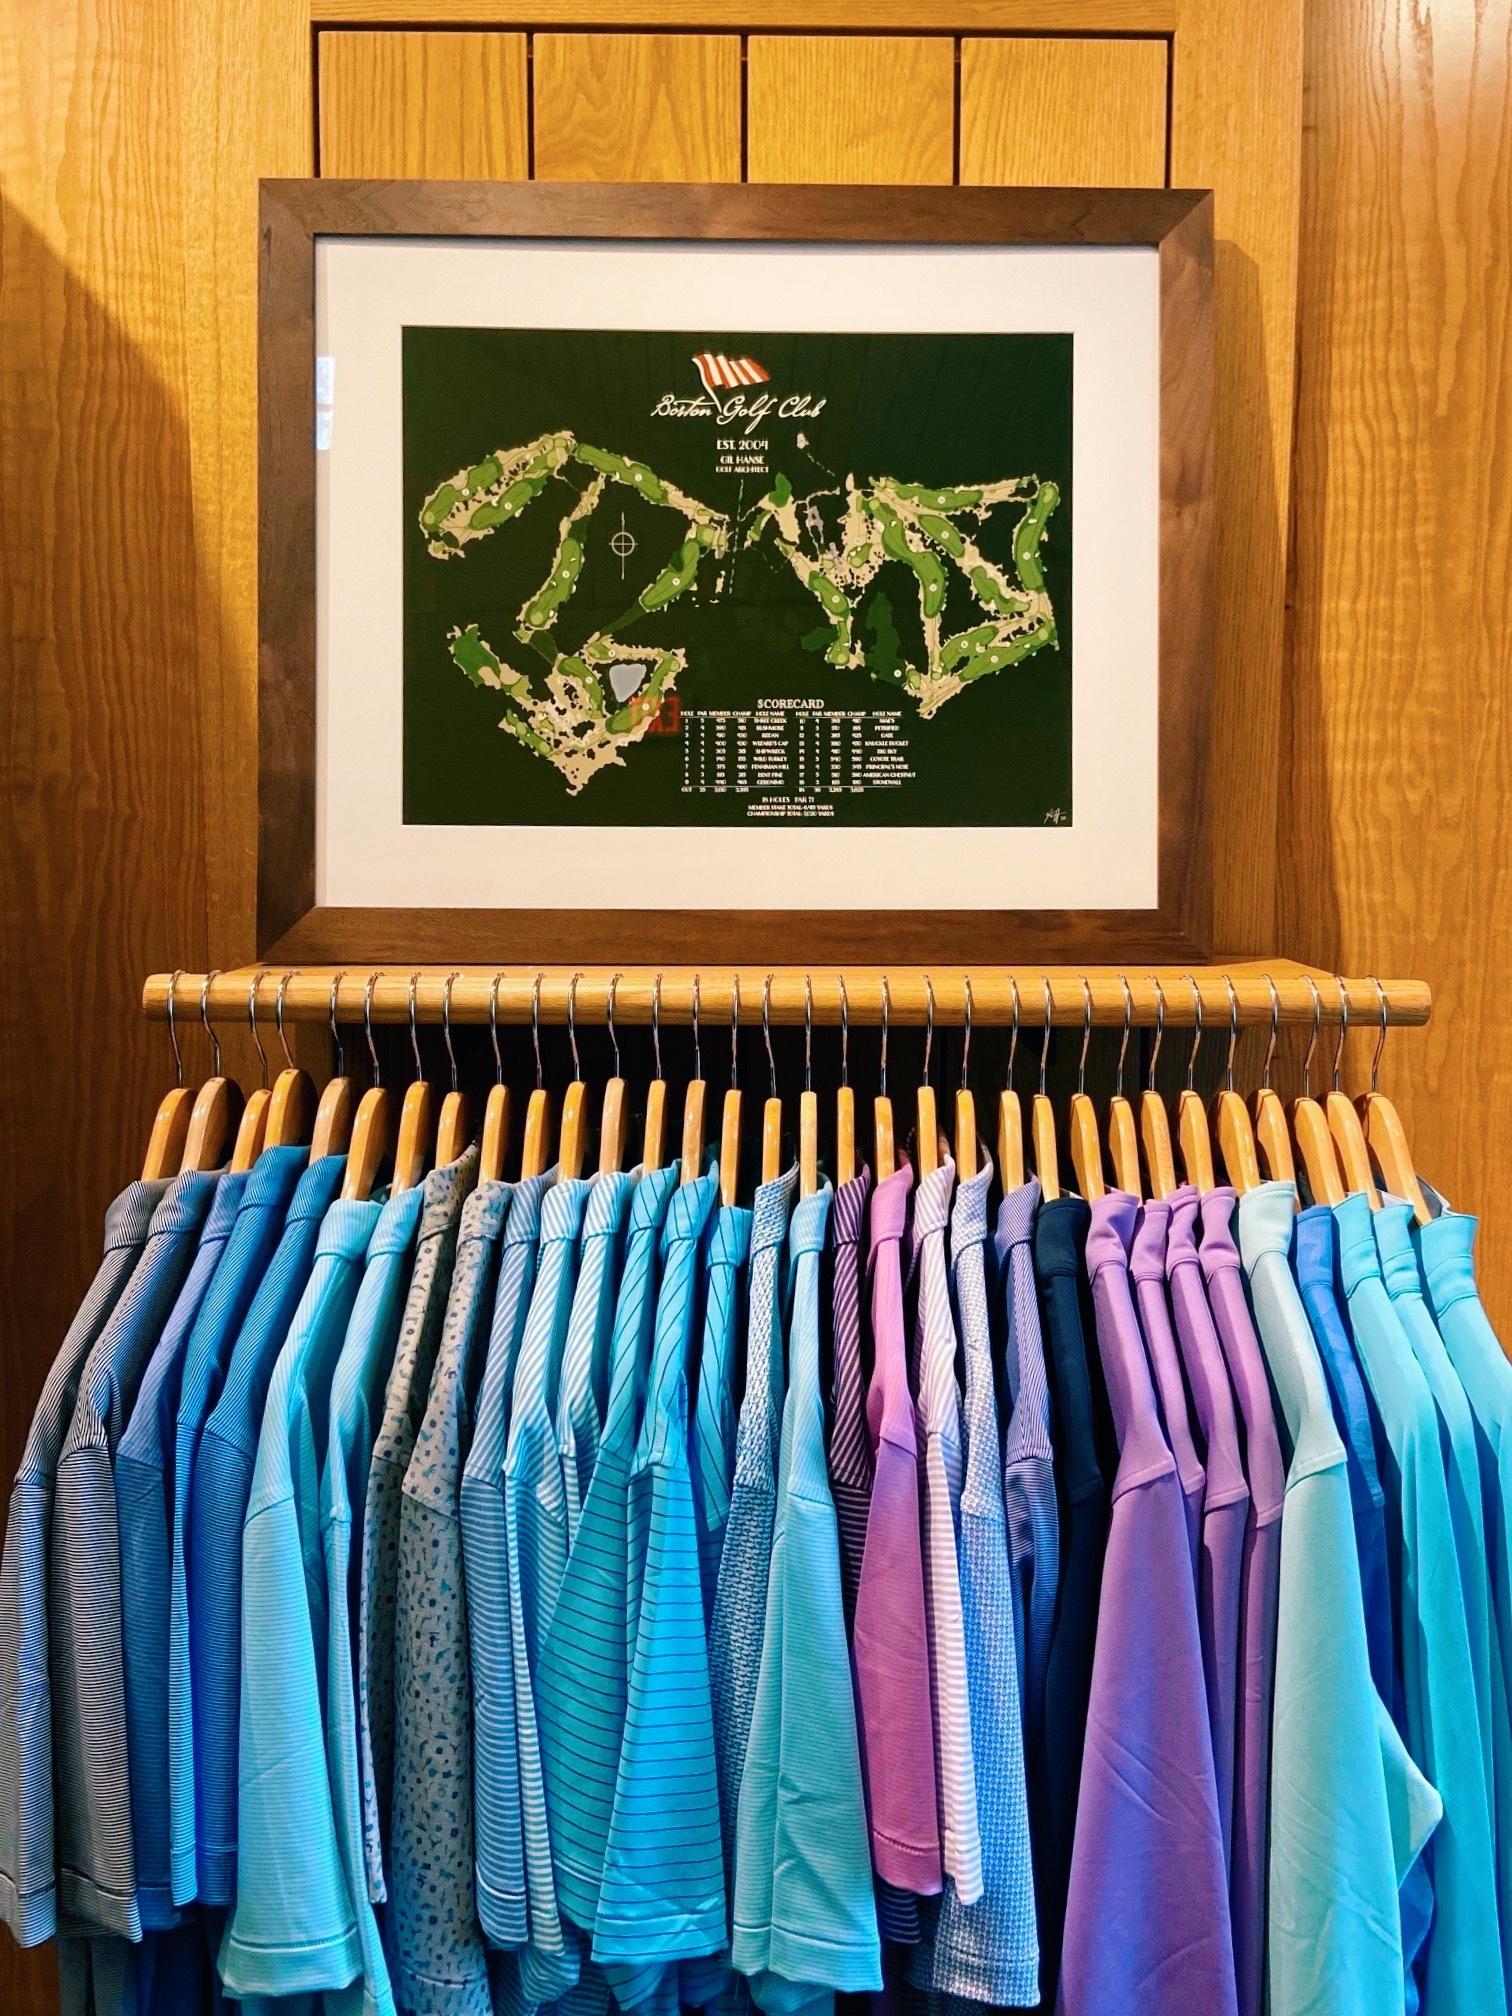 boston golf club course map framed in closet